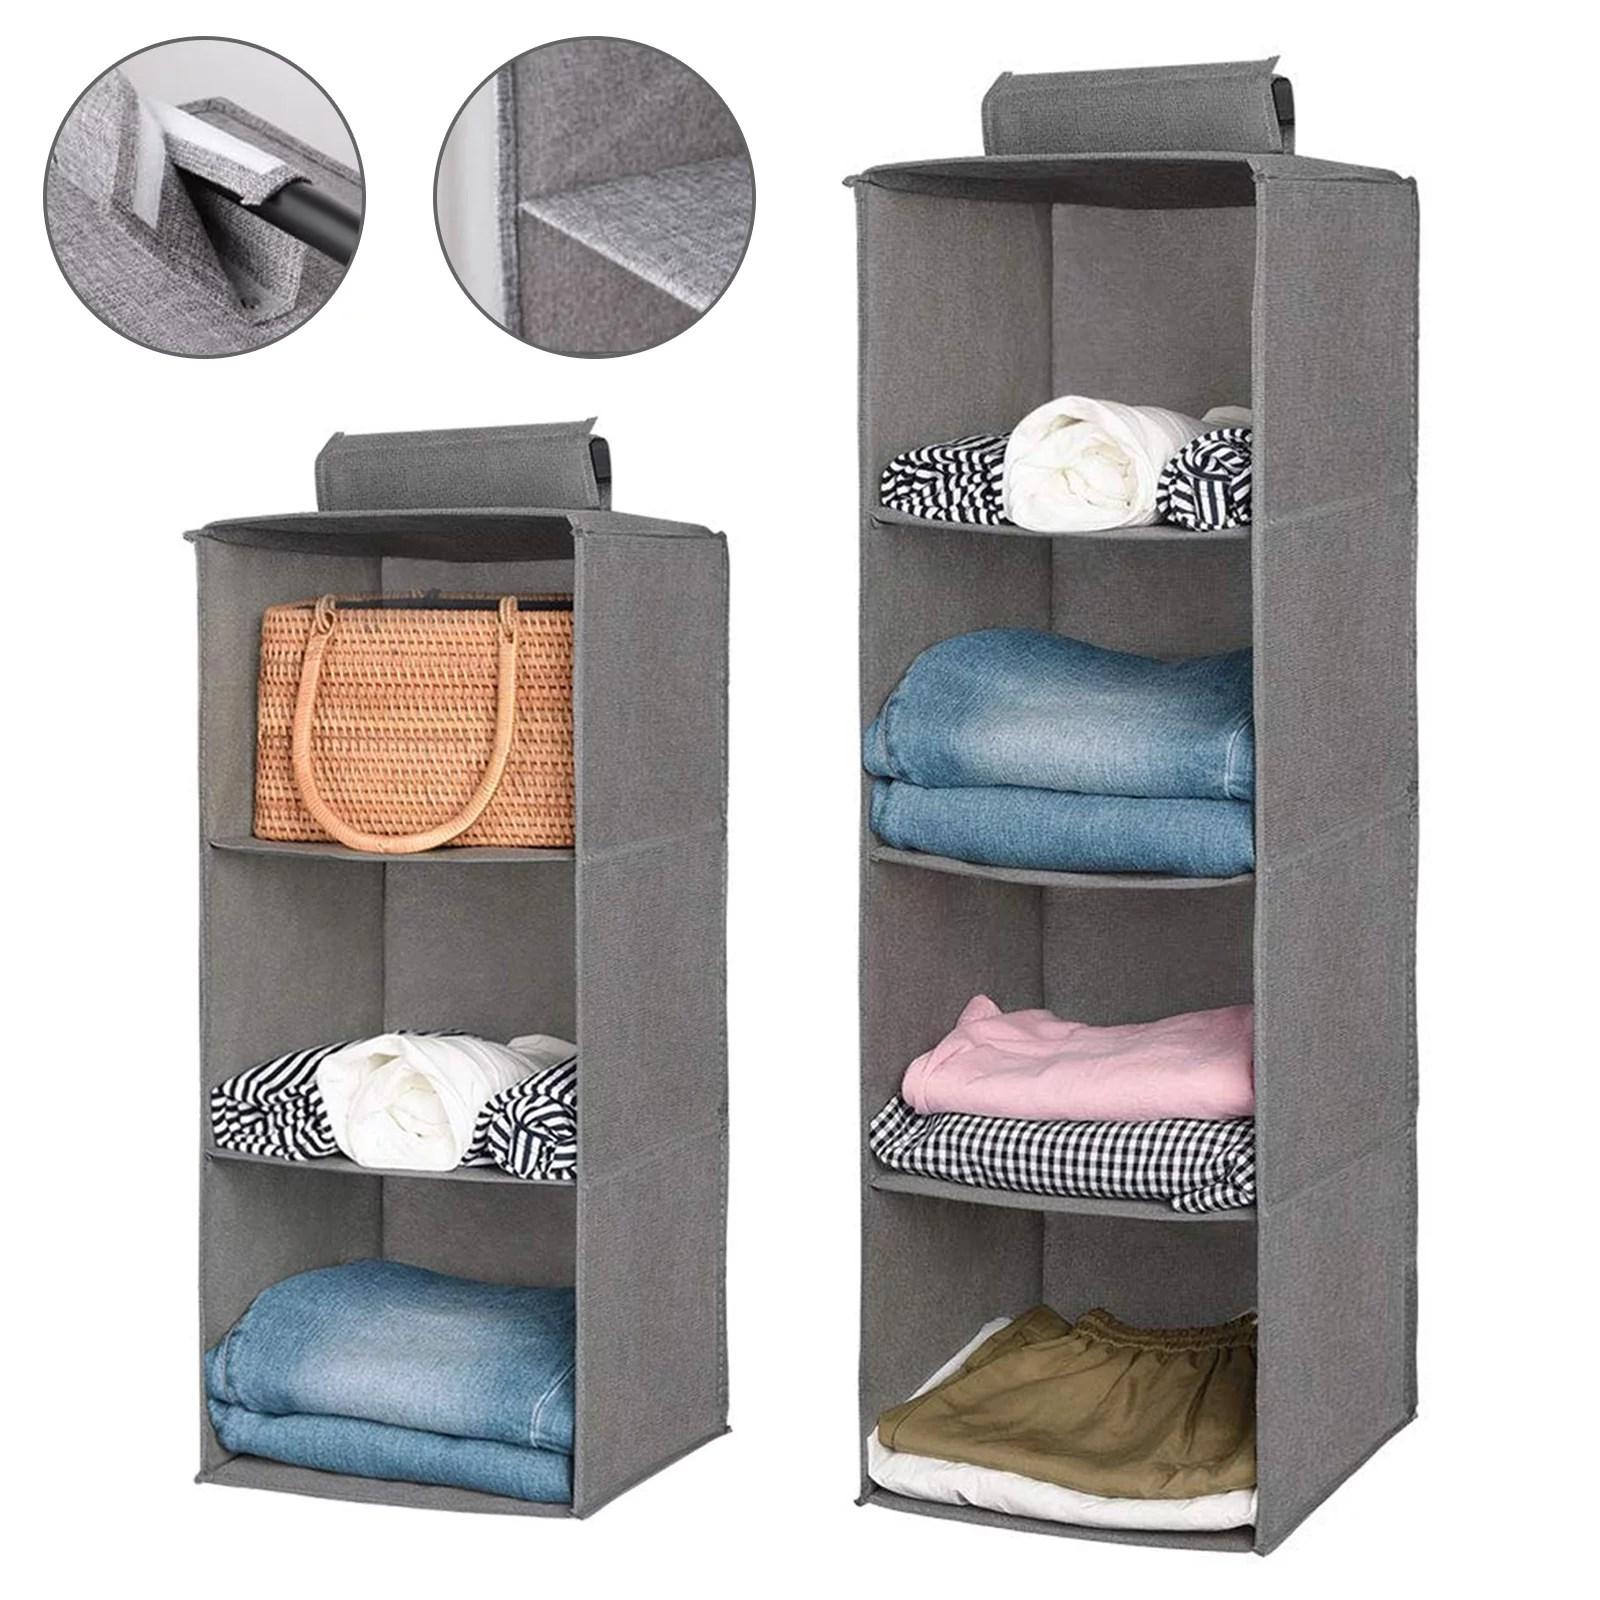 Foldable Hanging Closet Organizer   3/4 Shelf   Space ... on Closet Space Savers Walmart  id=81453